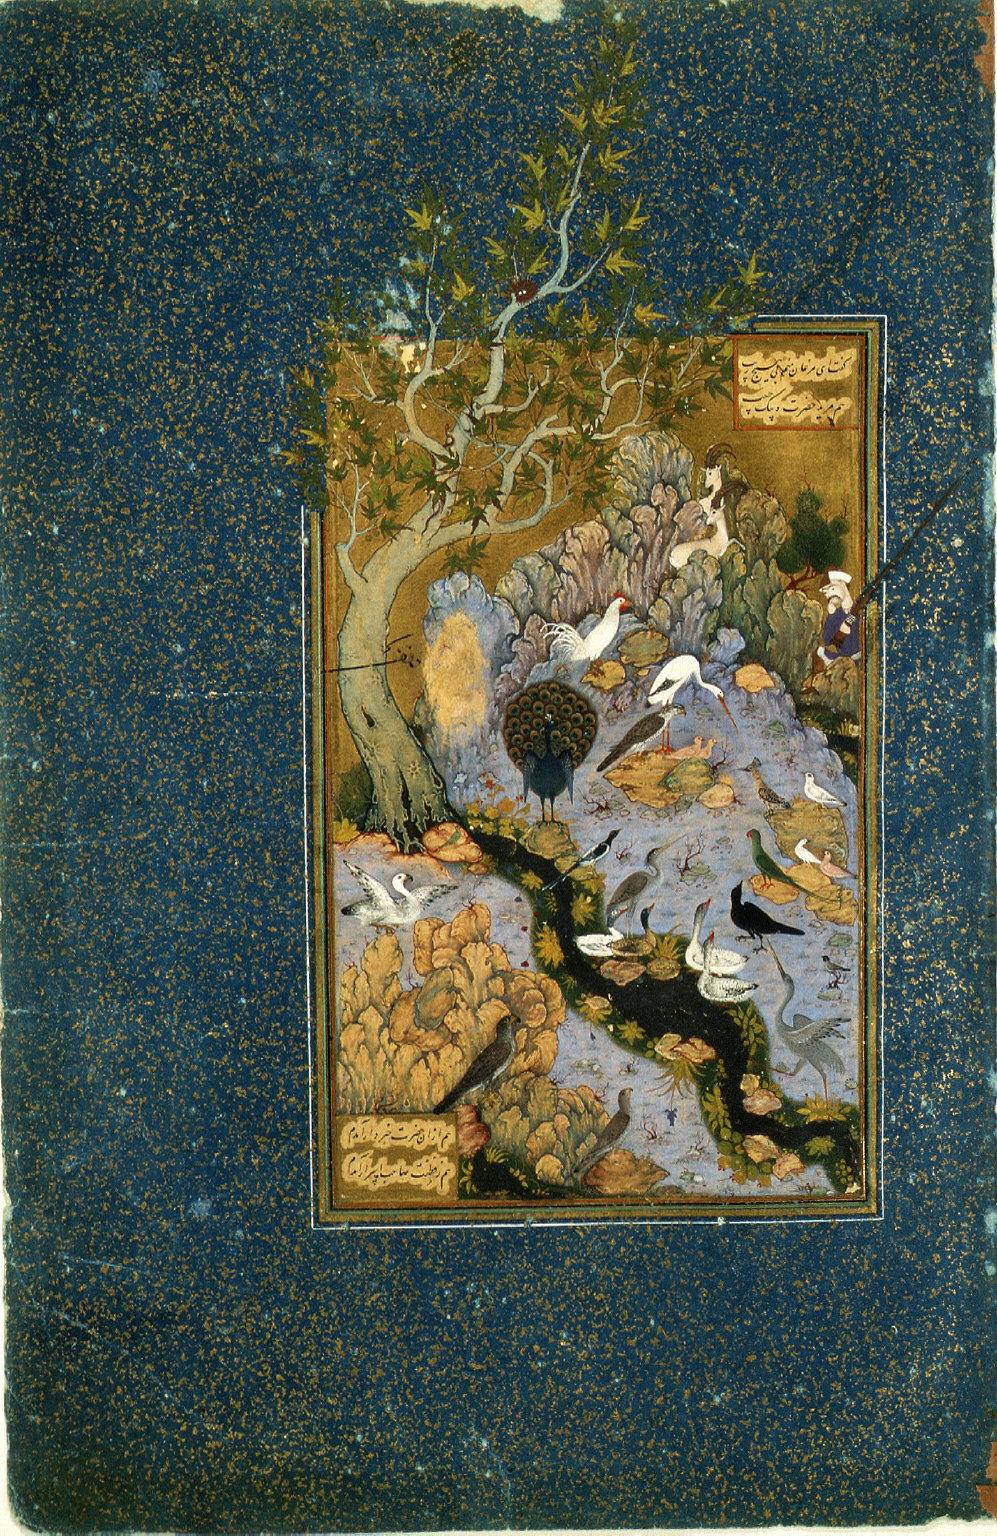 Mantiq al-tair (The Language of the Birds)